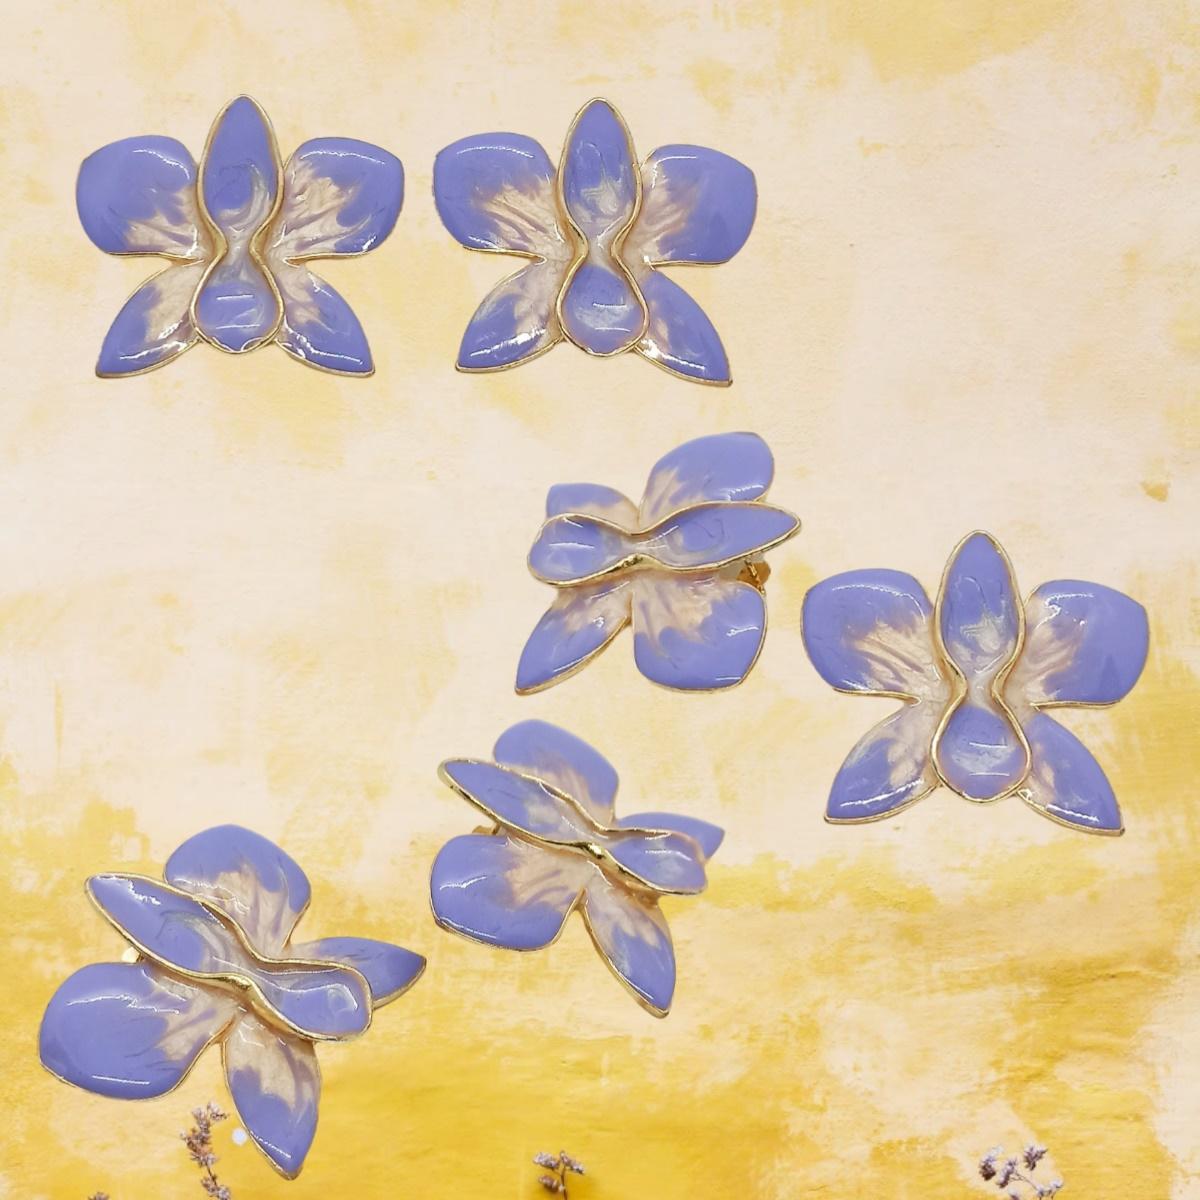 Brinco Orquídea Esmaltada, Moderno, Colorido, Folheado a Ouro 18k.